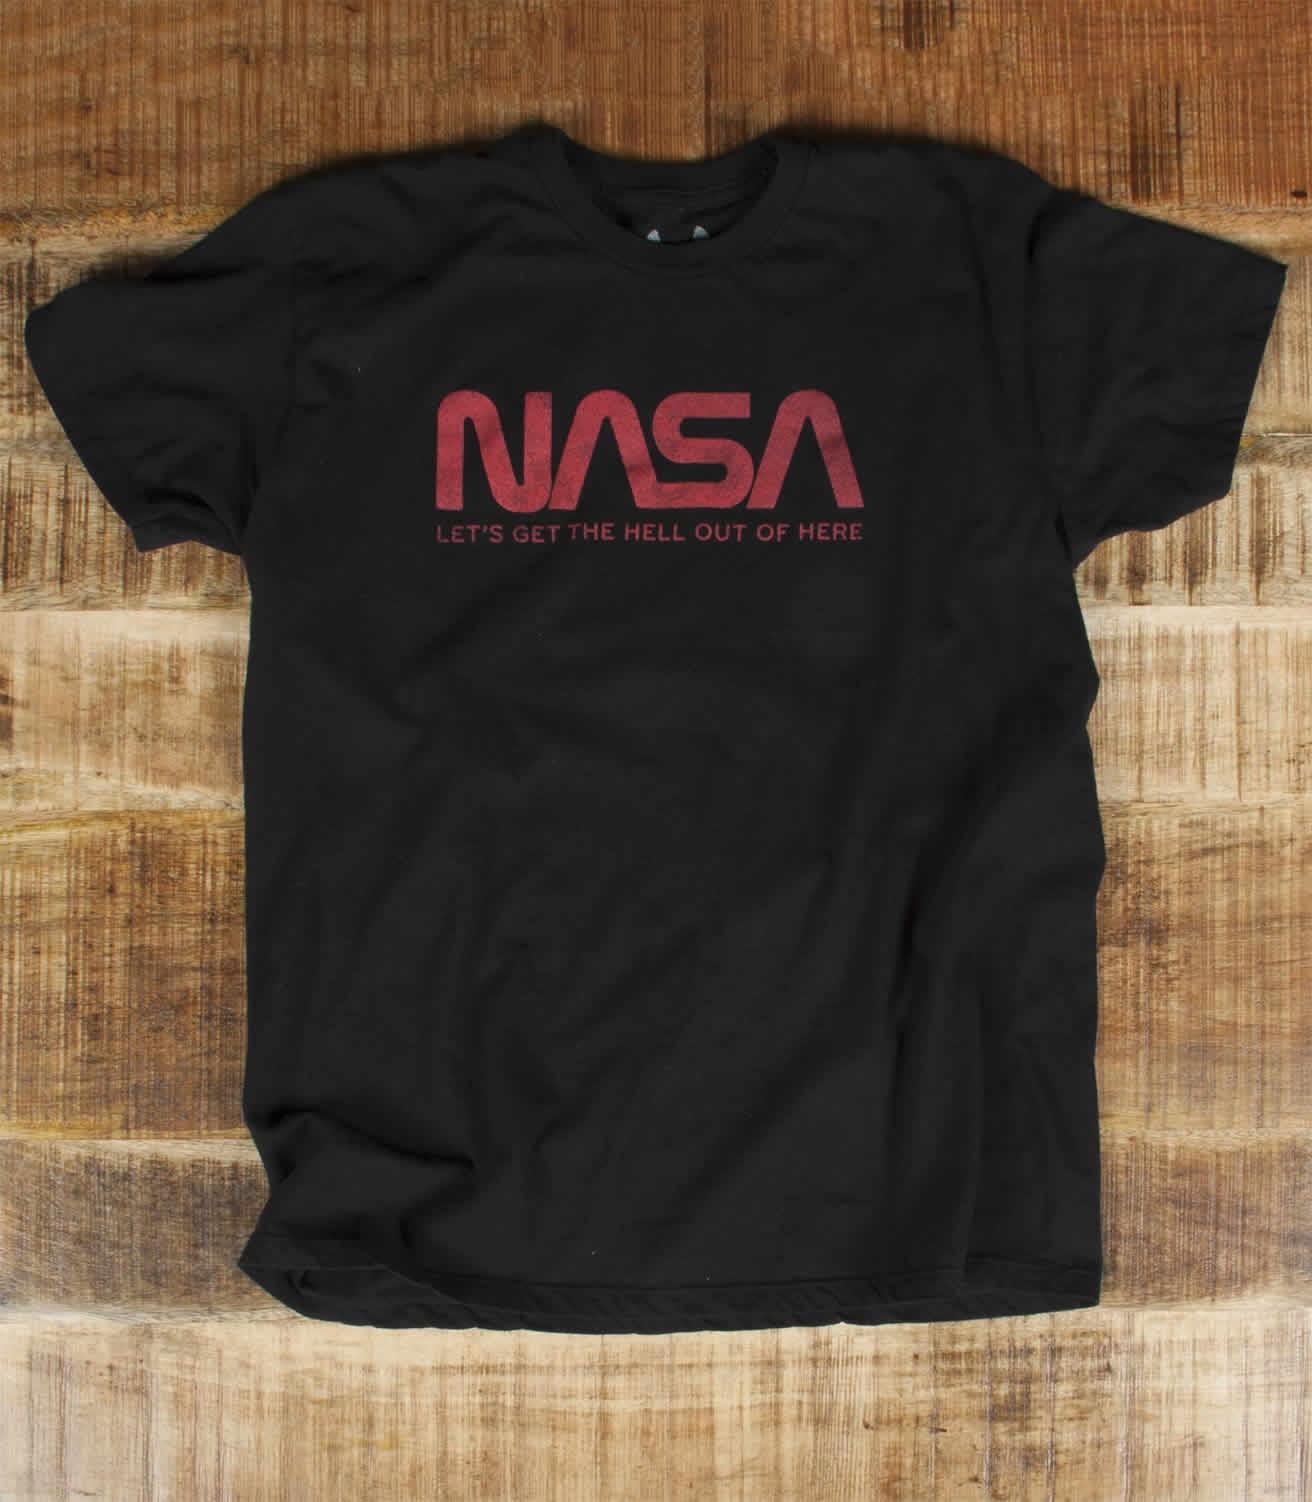 nasa men 39 s funny science t shirt headline shirts. Black Bedroom Furniture Sets. Home Design Ideas